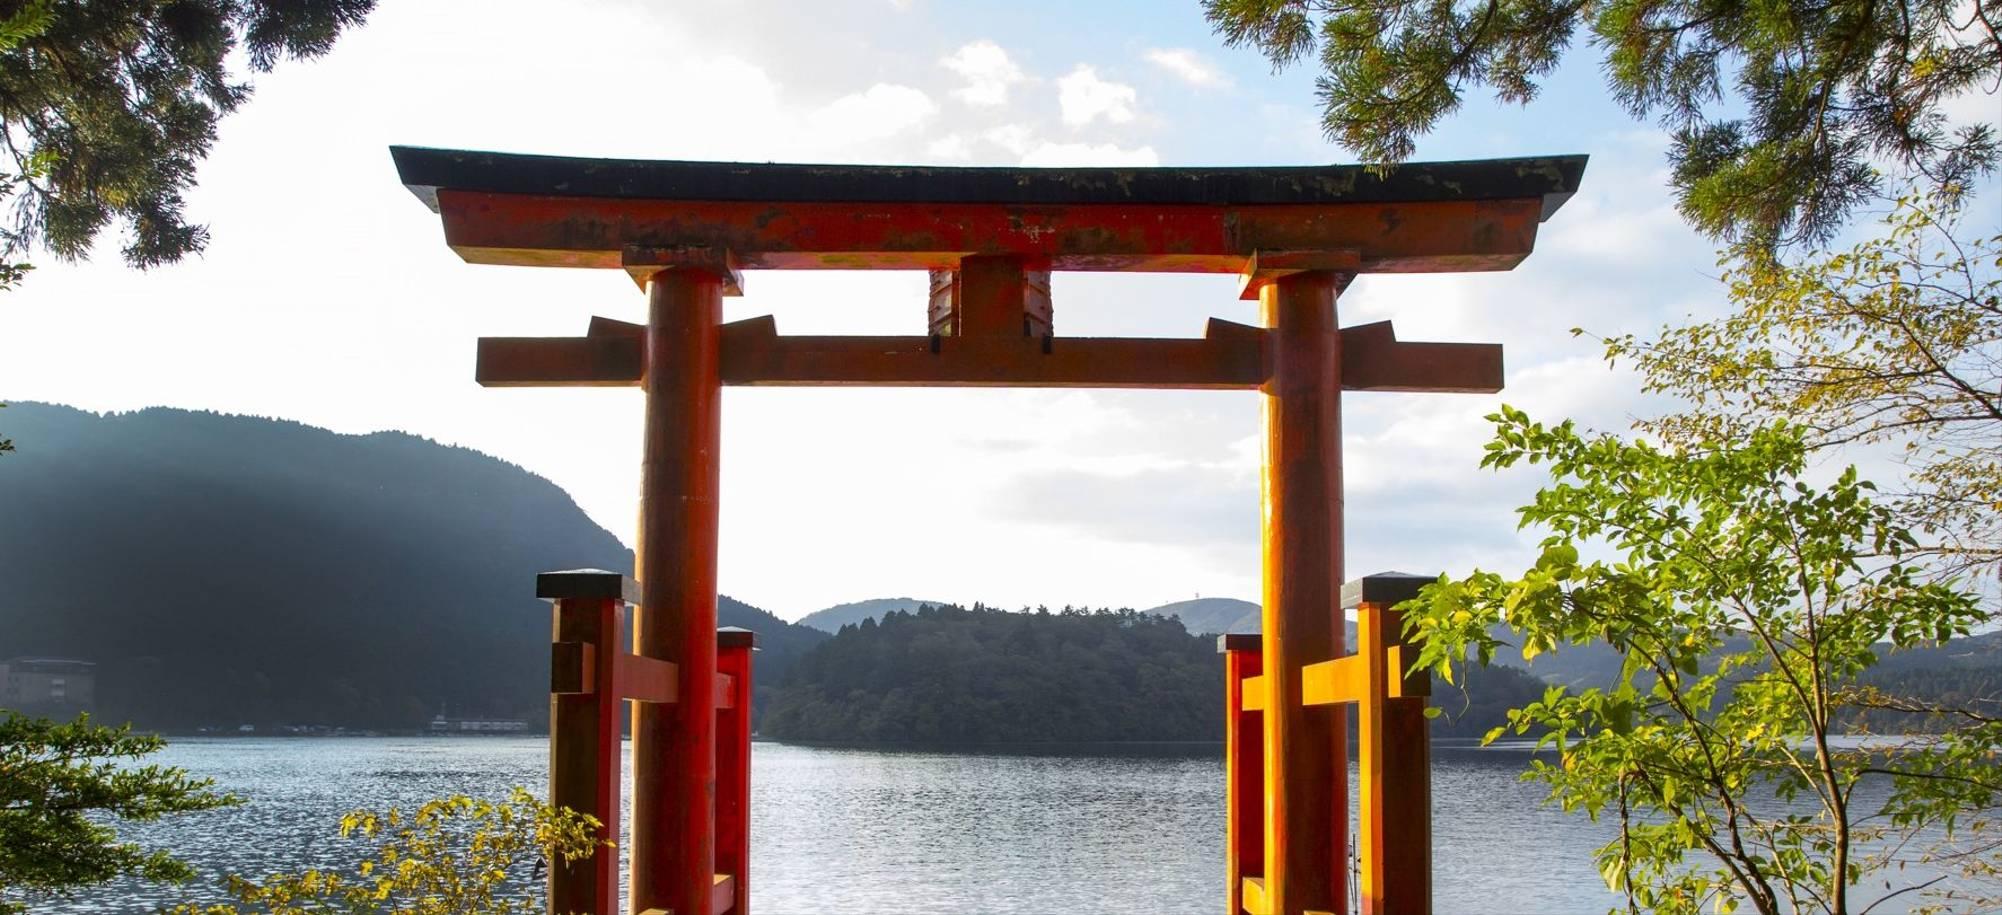 2 Day   Mount Fuji, Hakone Shrine'S Gate And Lake Ashi   Itinerary Desktop